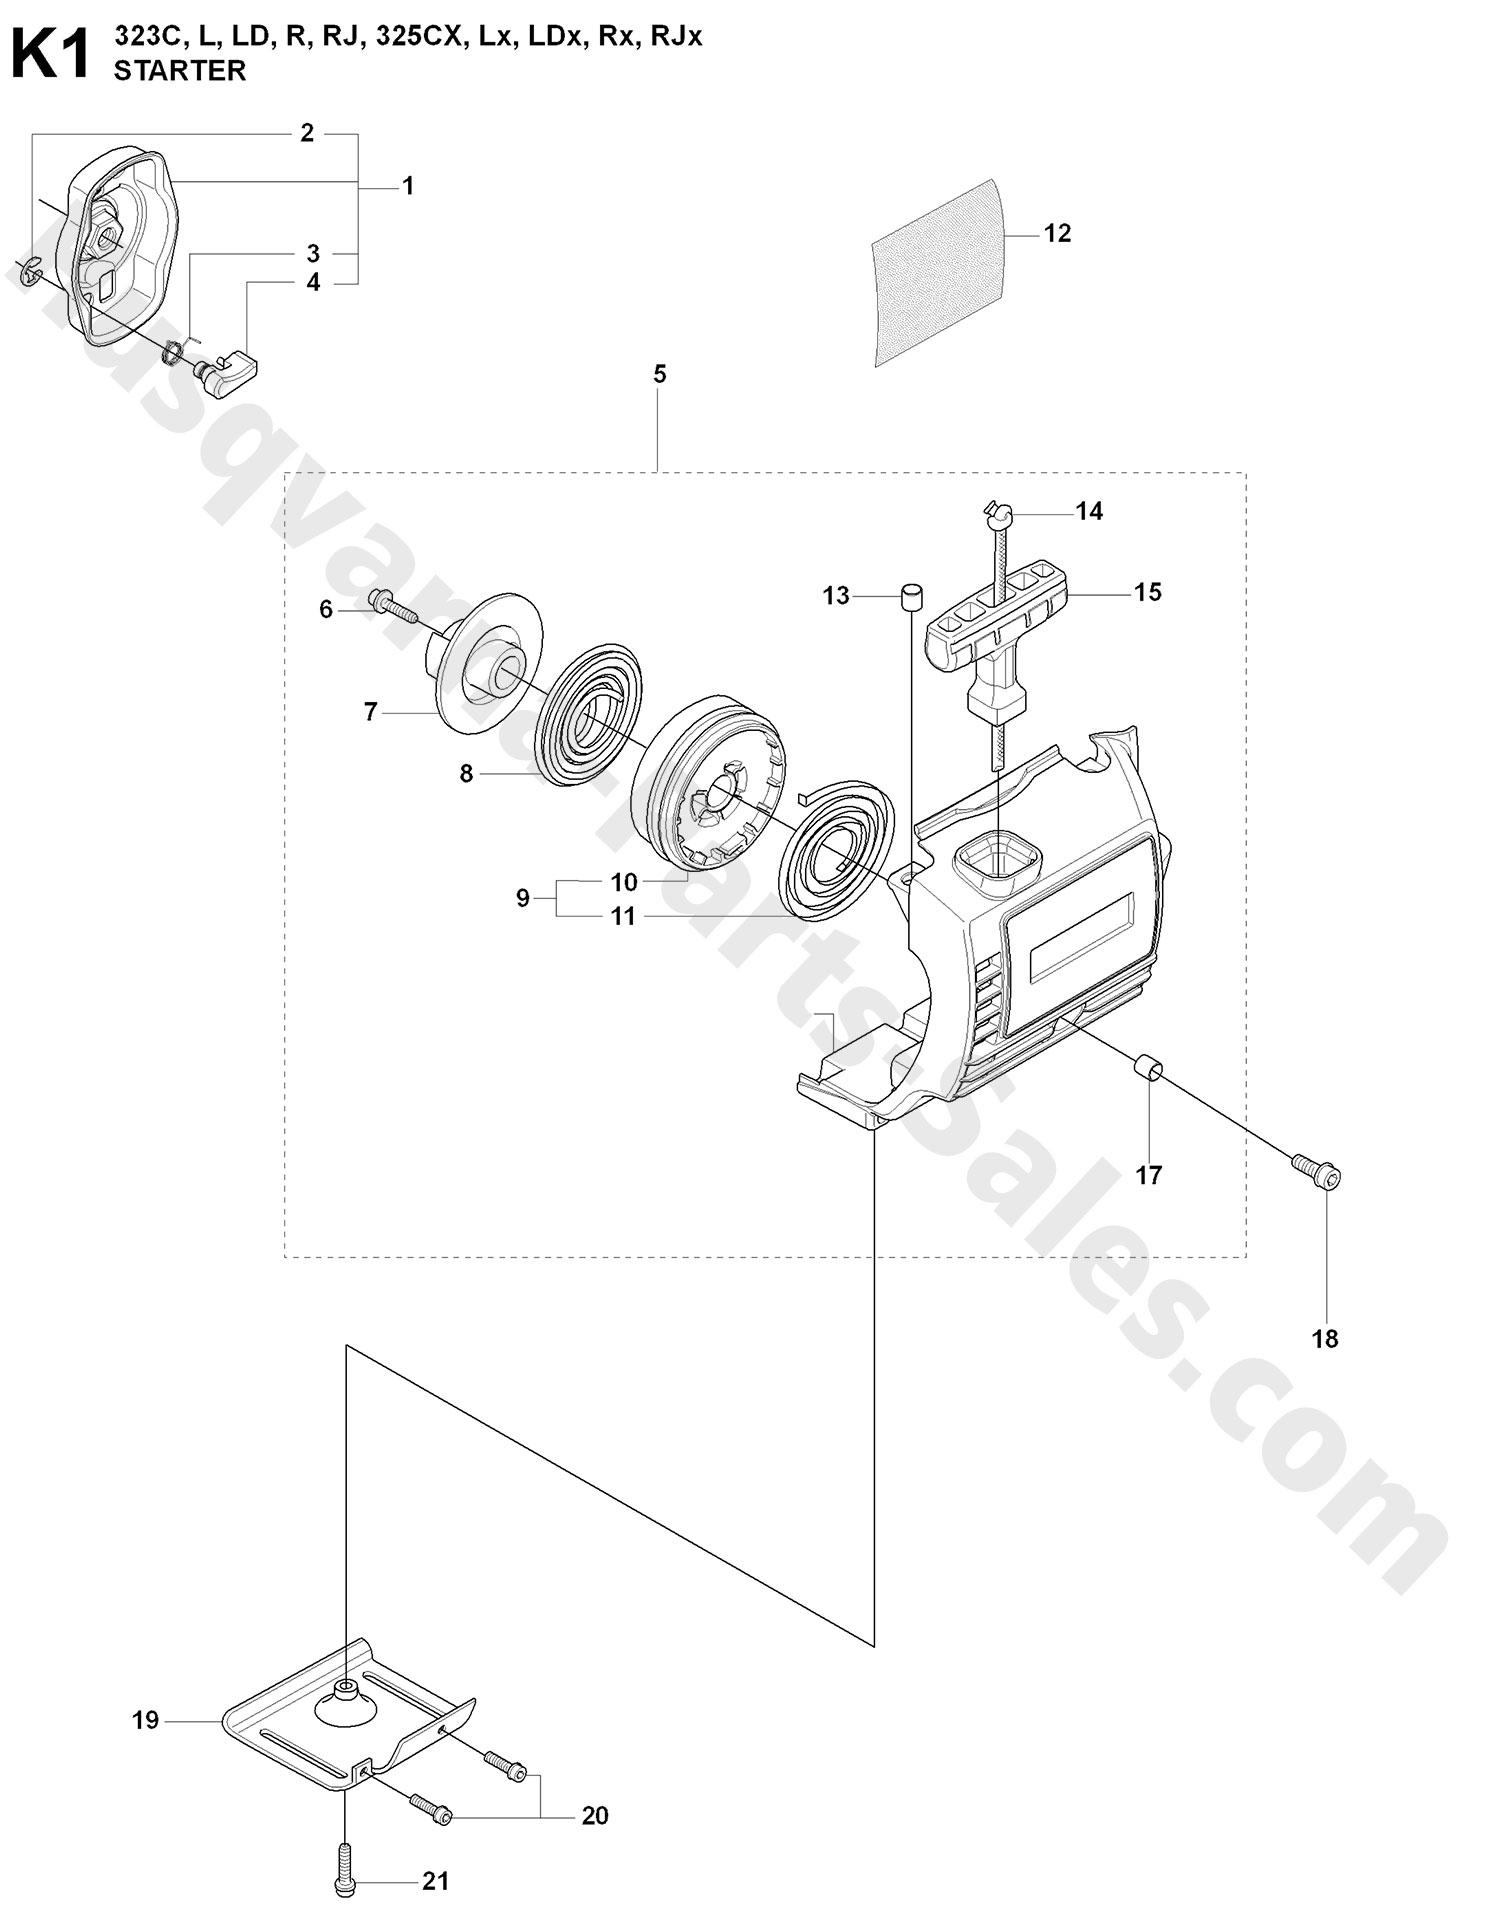 323R Husqvarna Brushcutter Starter (K1) Parts